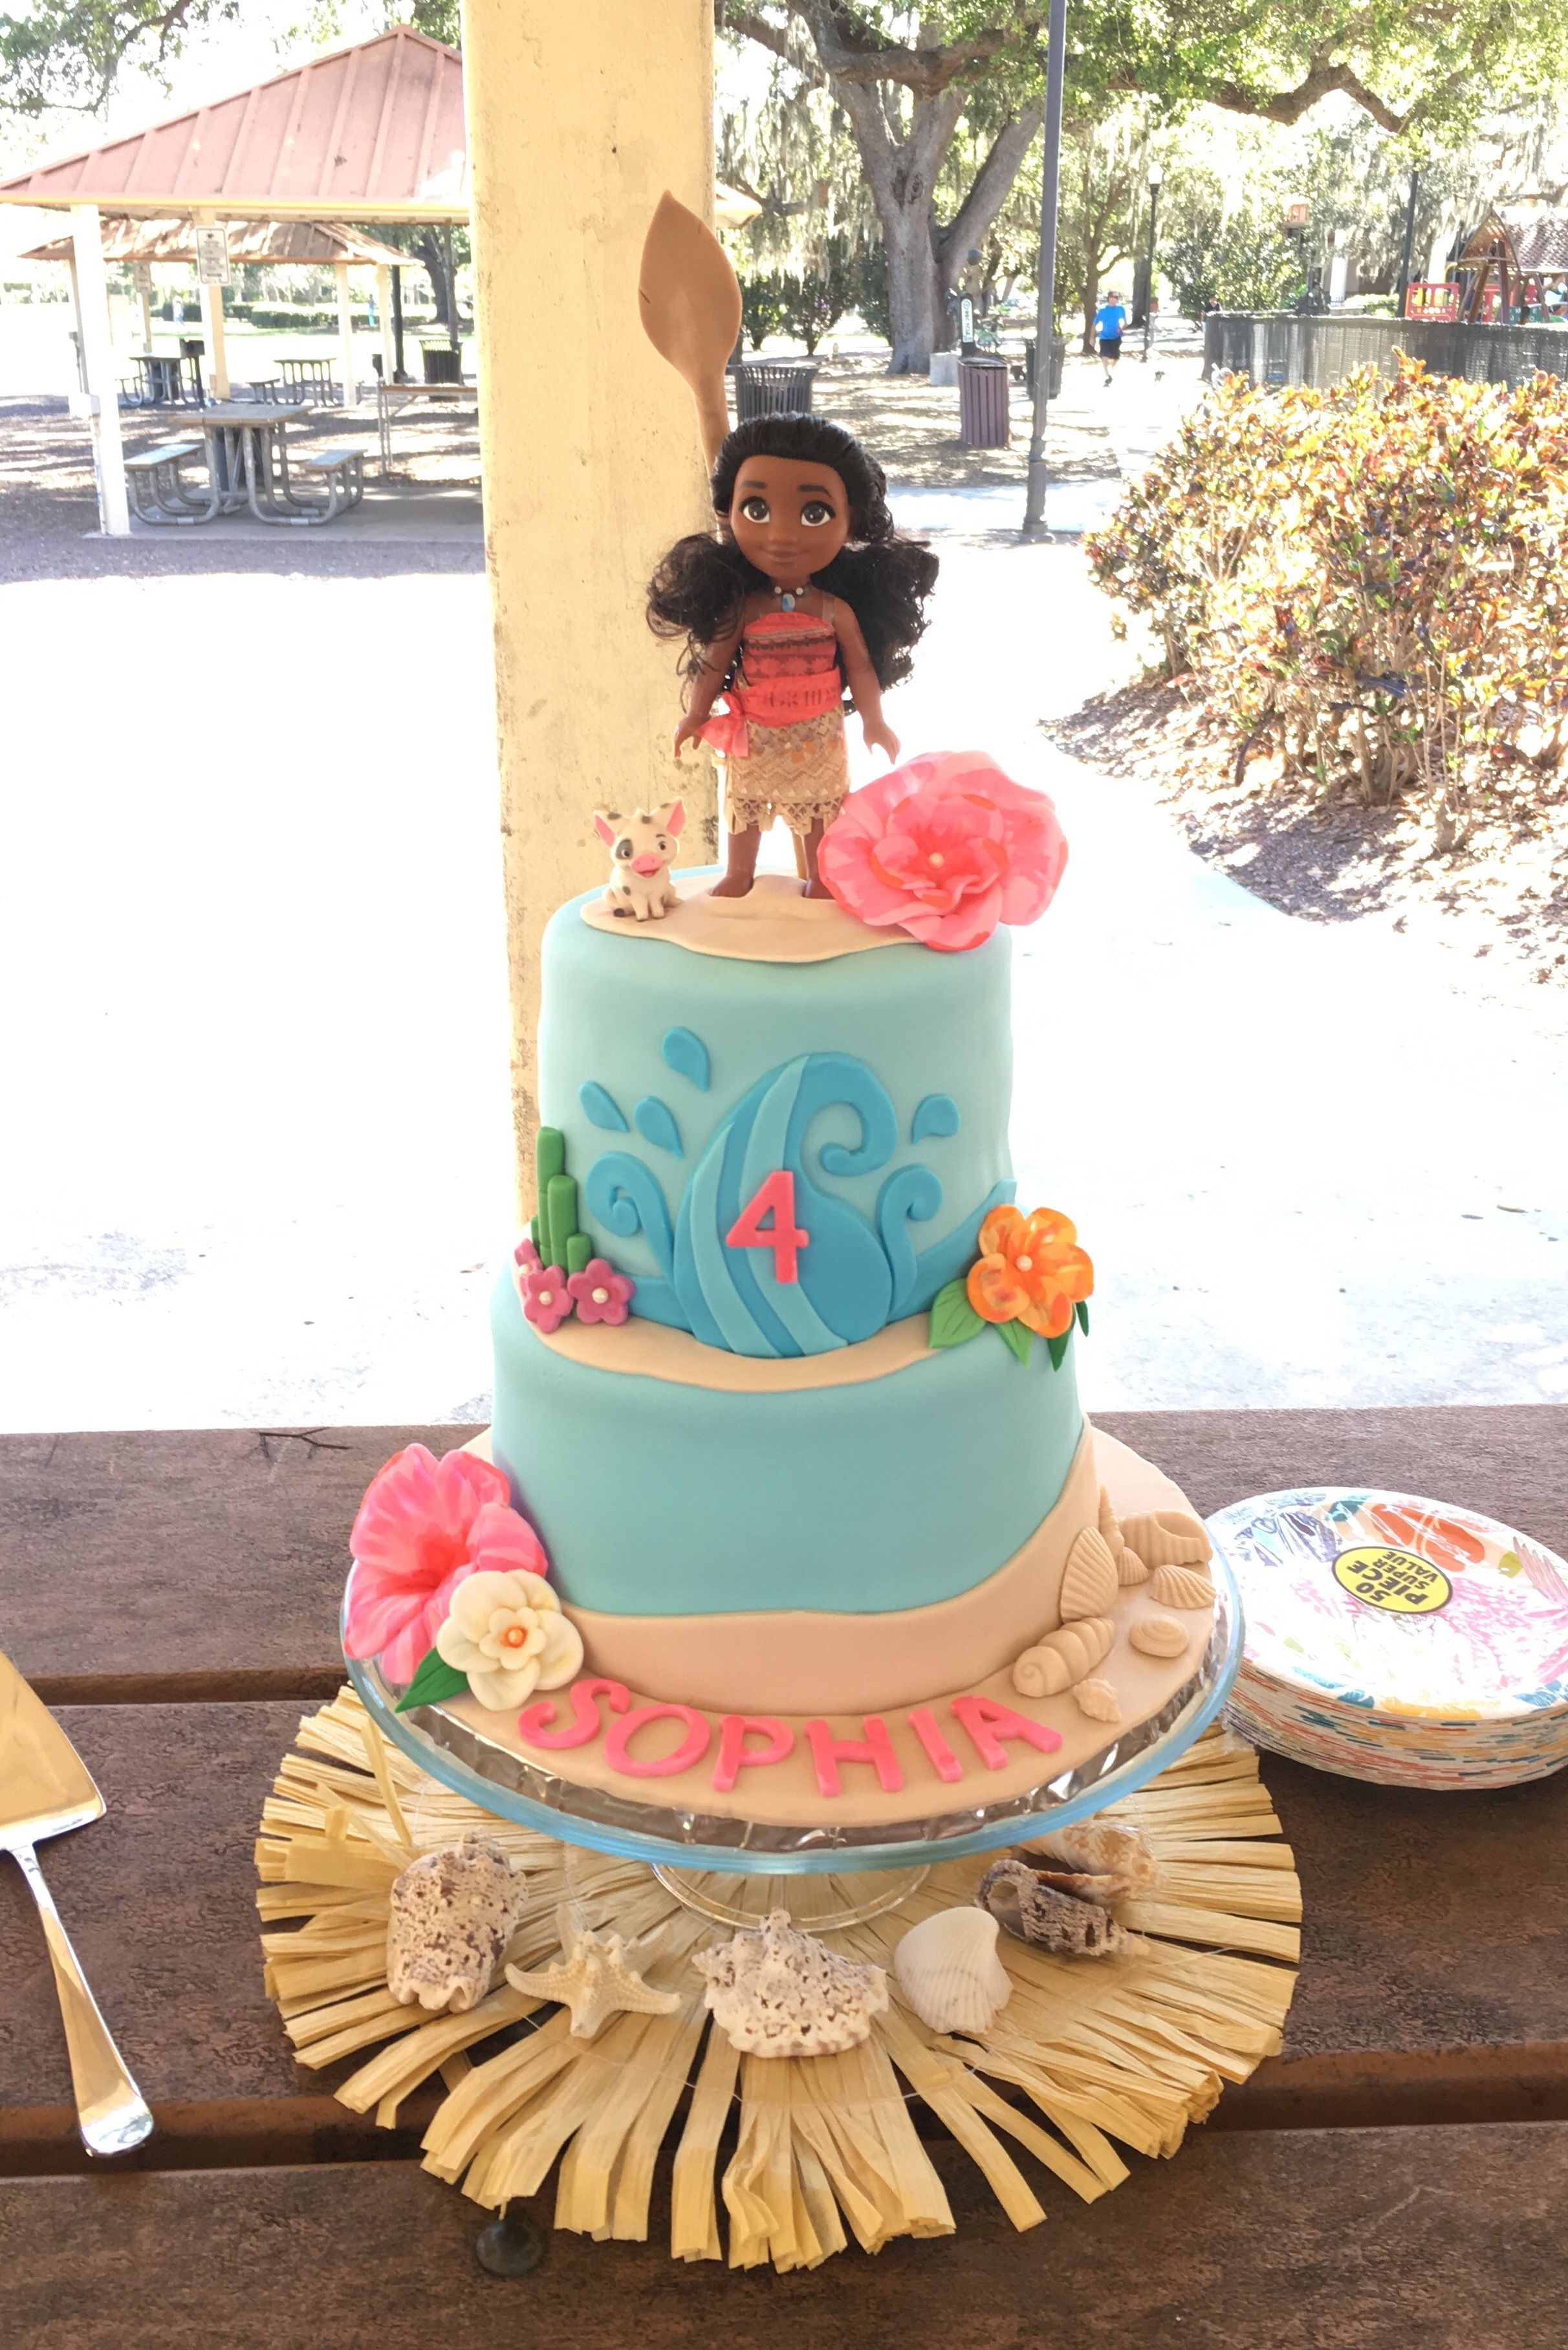 best 25 moanna cake ideas on pinterest moana theme cake moana birthday party theme and moana. Black Bedroom Furniture Sets. Home Design Ideas